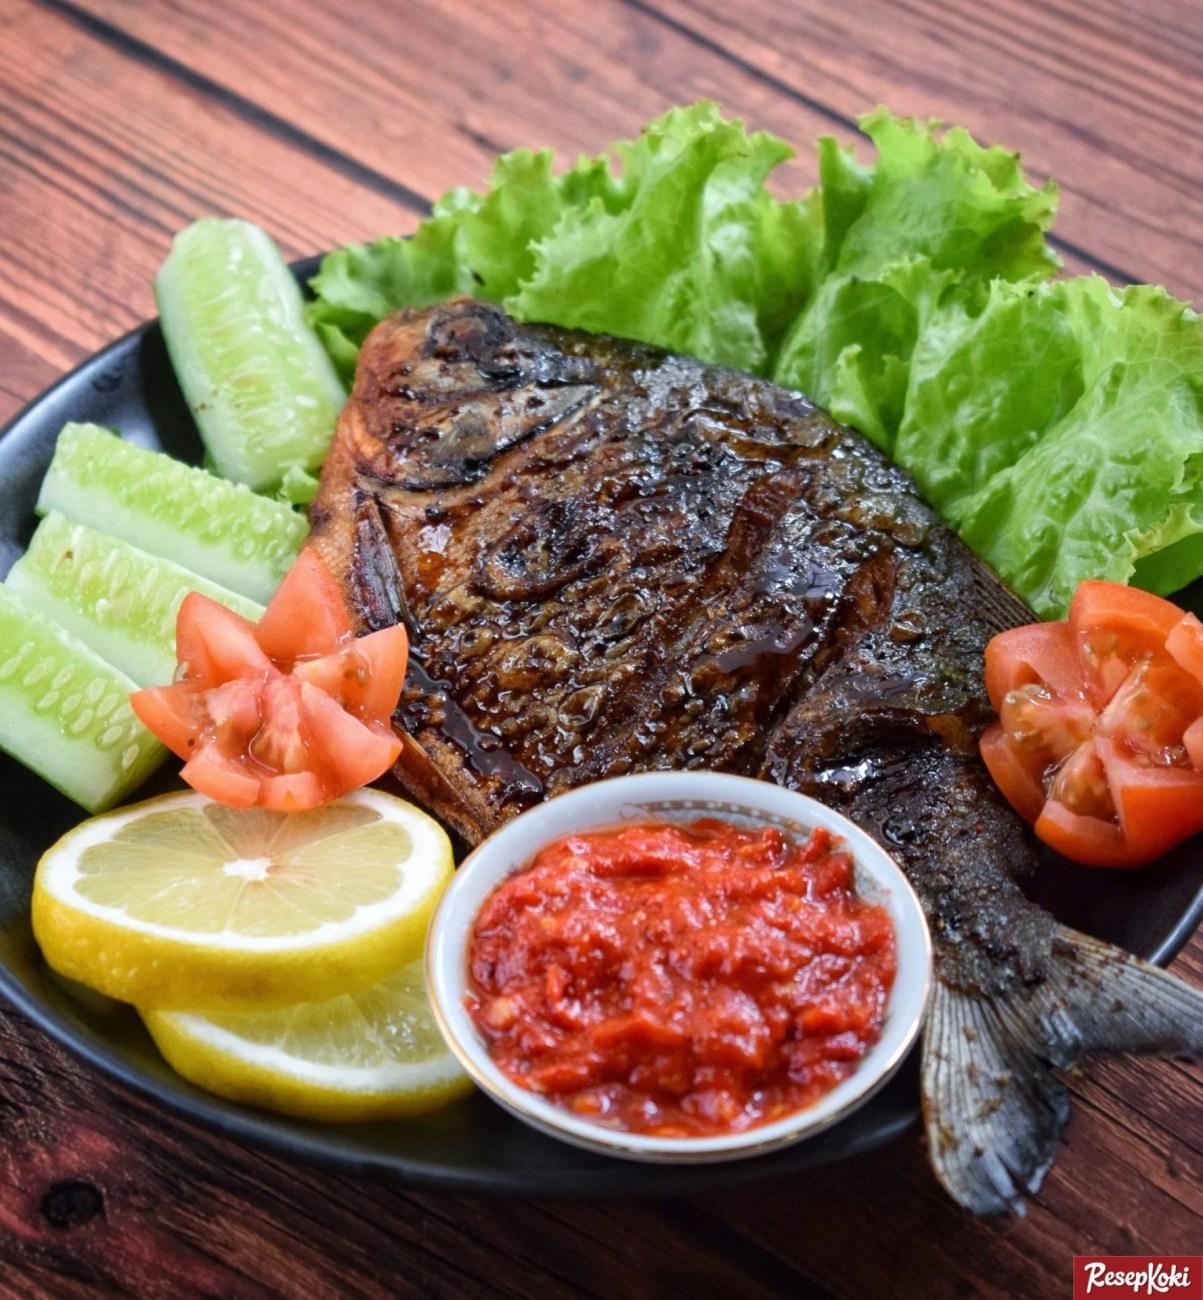 Resep Ikan Bawal Bakar